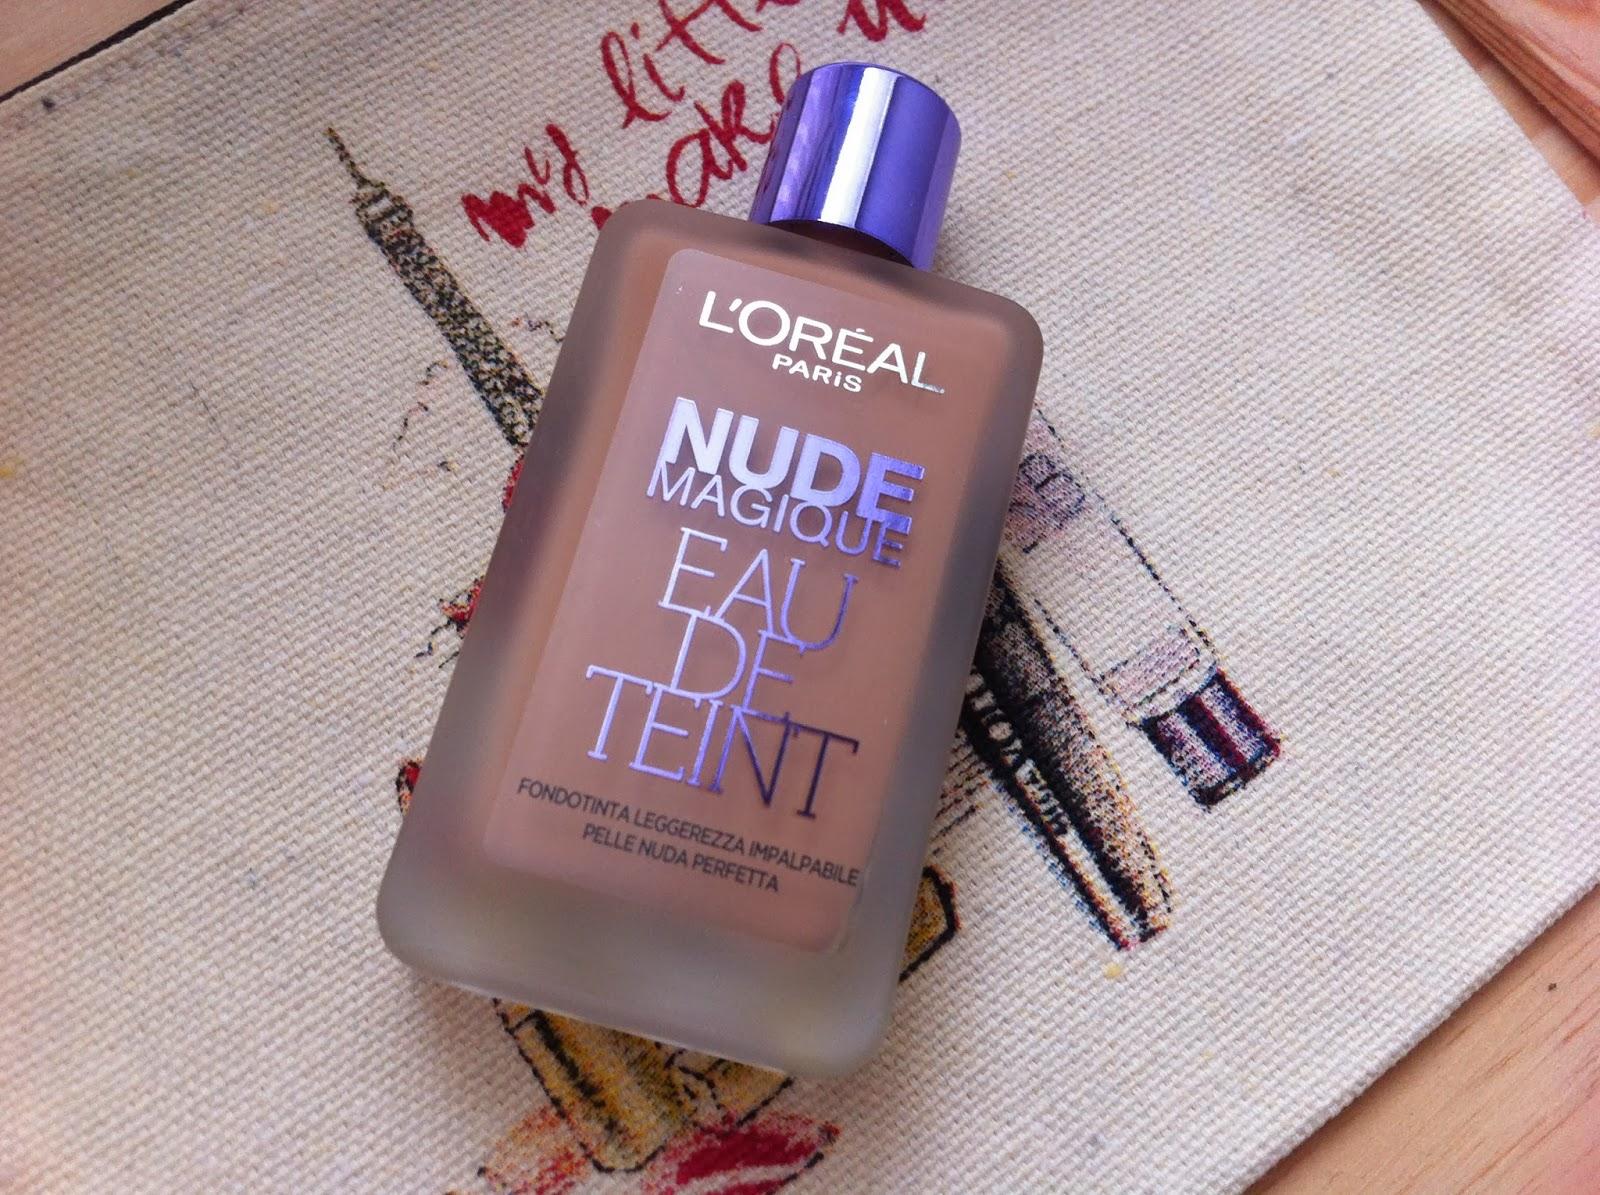 elisa vs make-up: LOreal: Nude Magique Eau de Teint